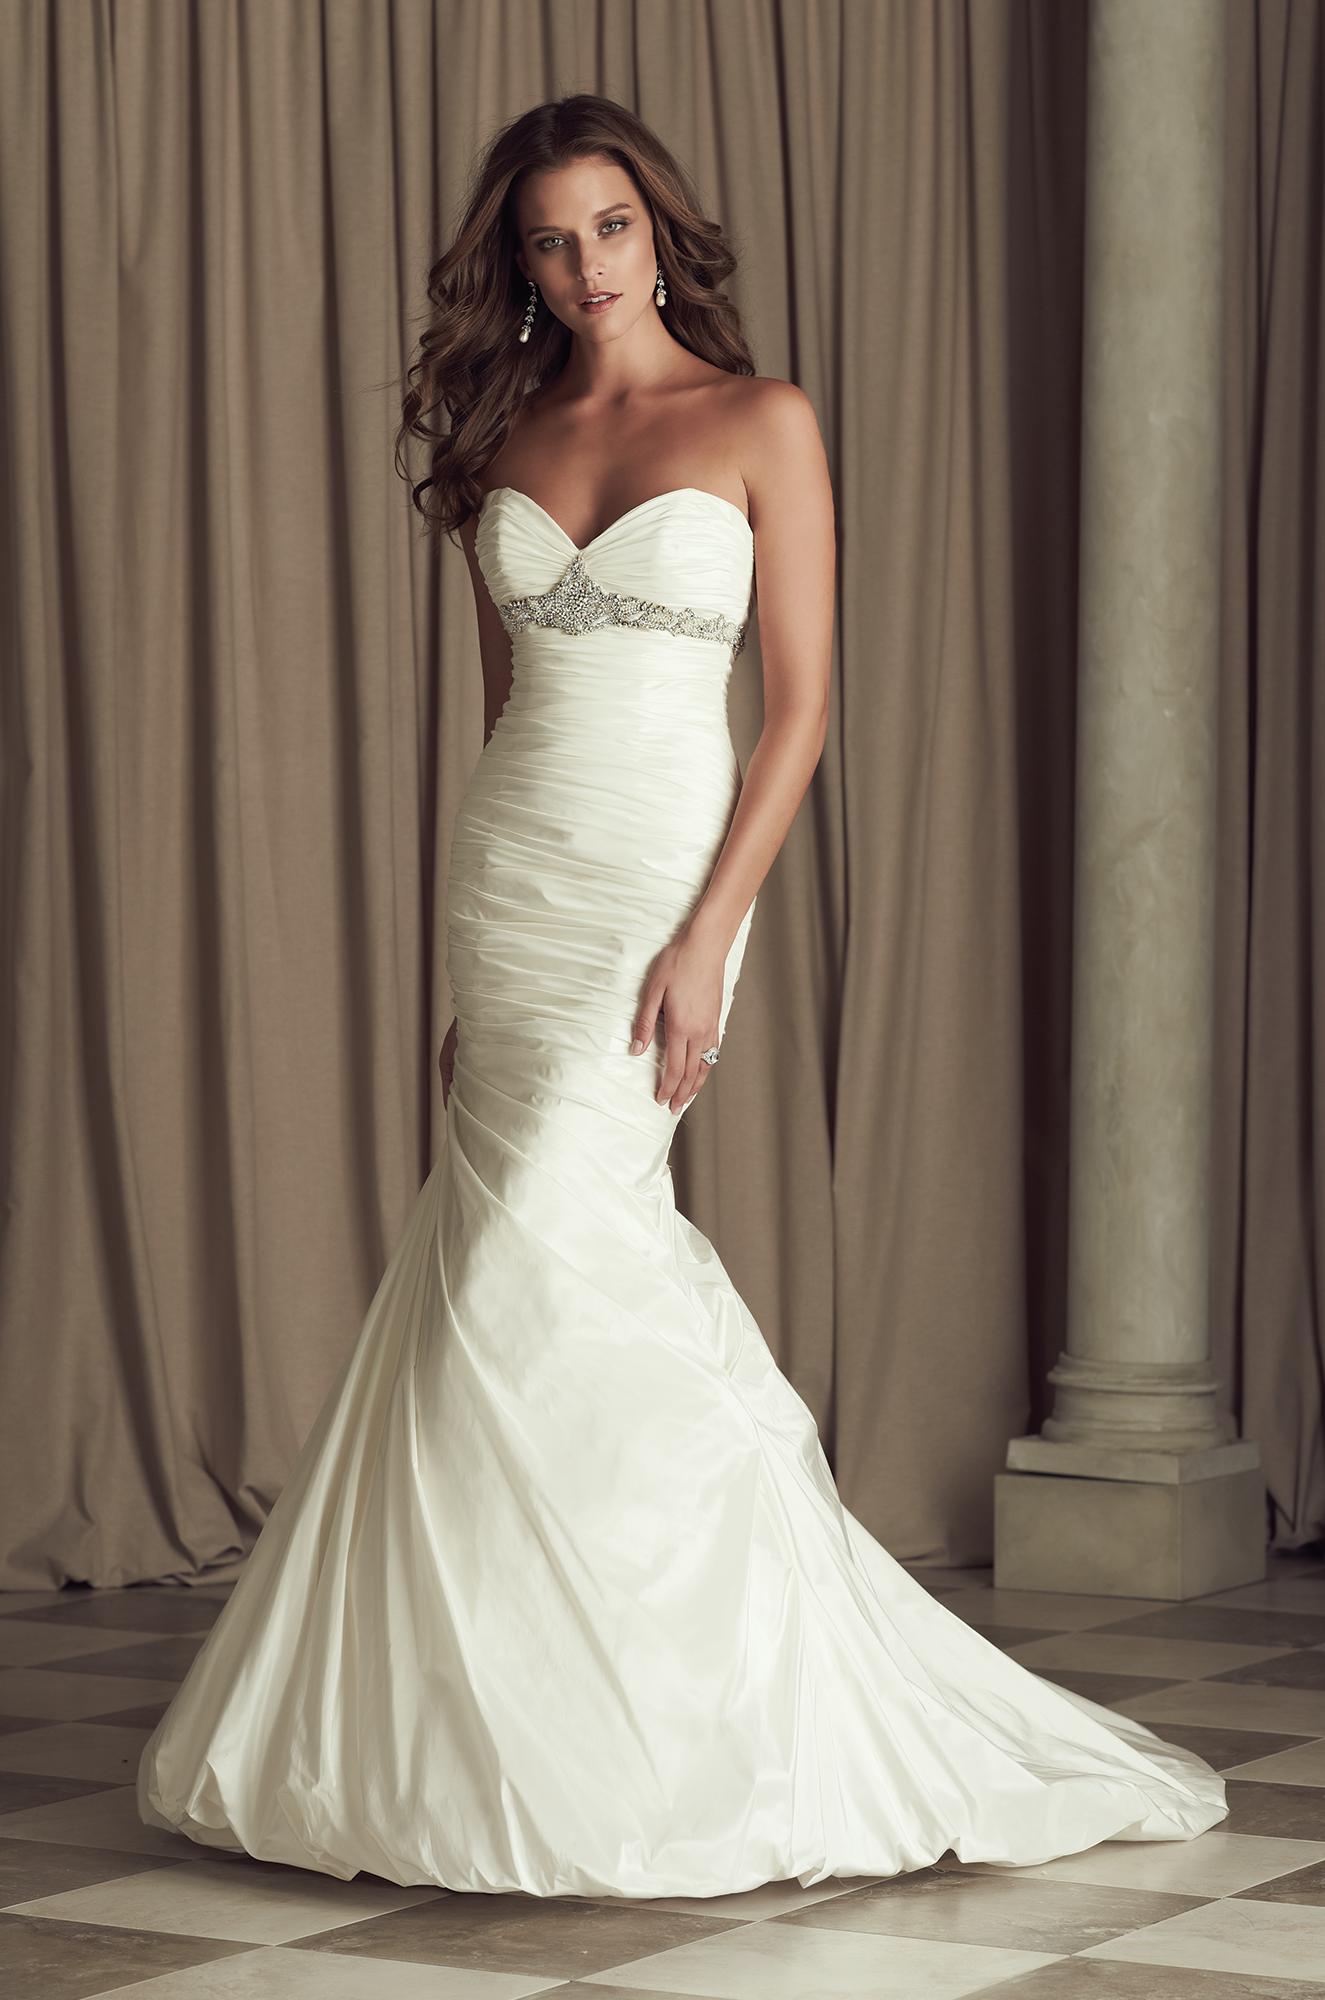 Paloma Blanca Wedding Dresses 2014 | Paloma blanca, Wedding dresses ...